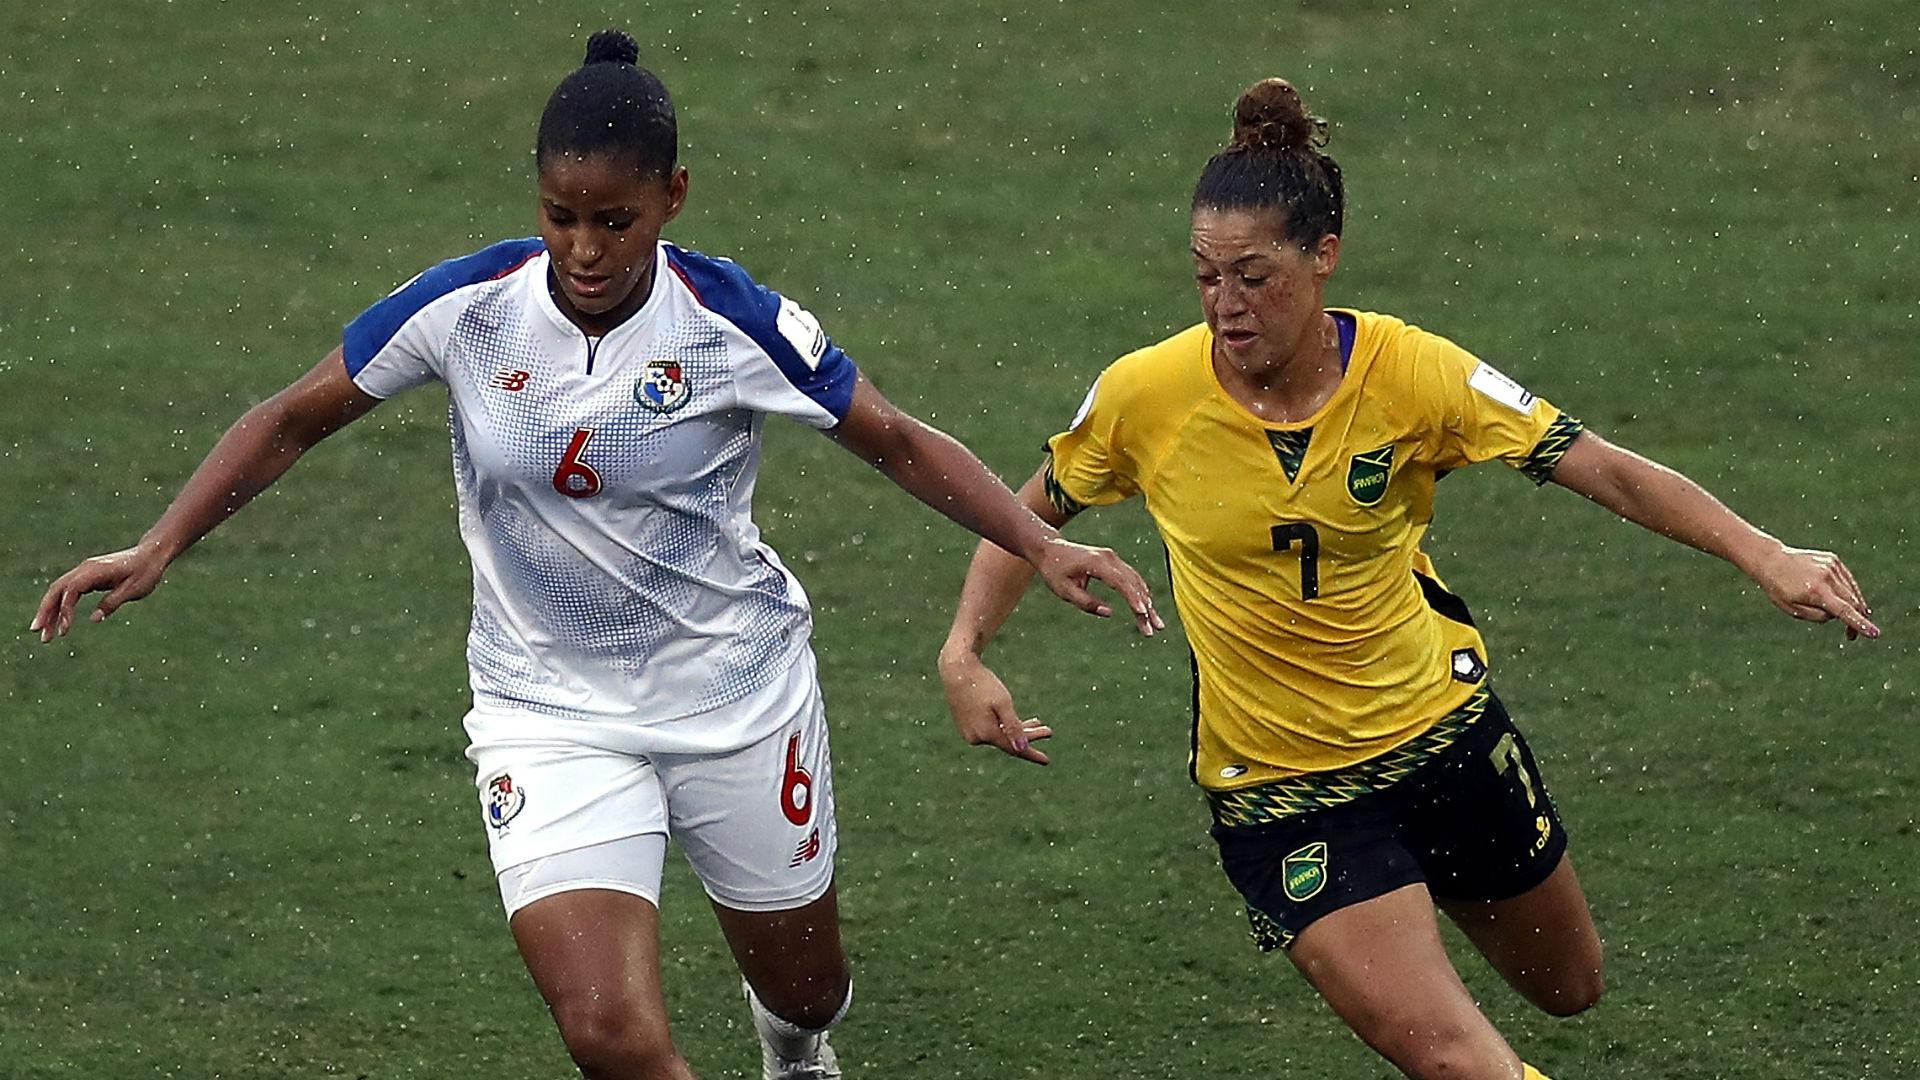 Aldrith Quintero Chinyelu Asher Panama Jamaica Concacaf women's